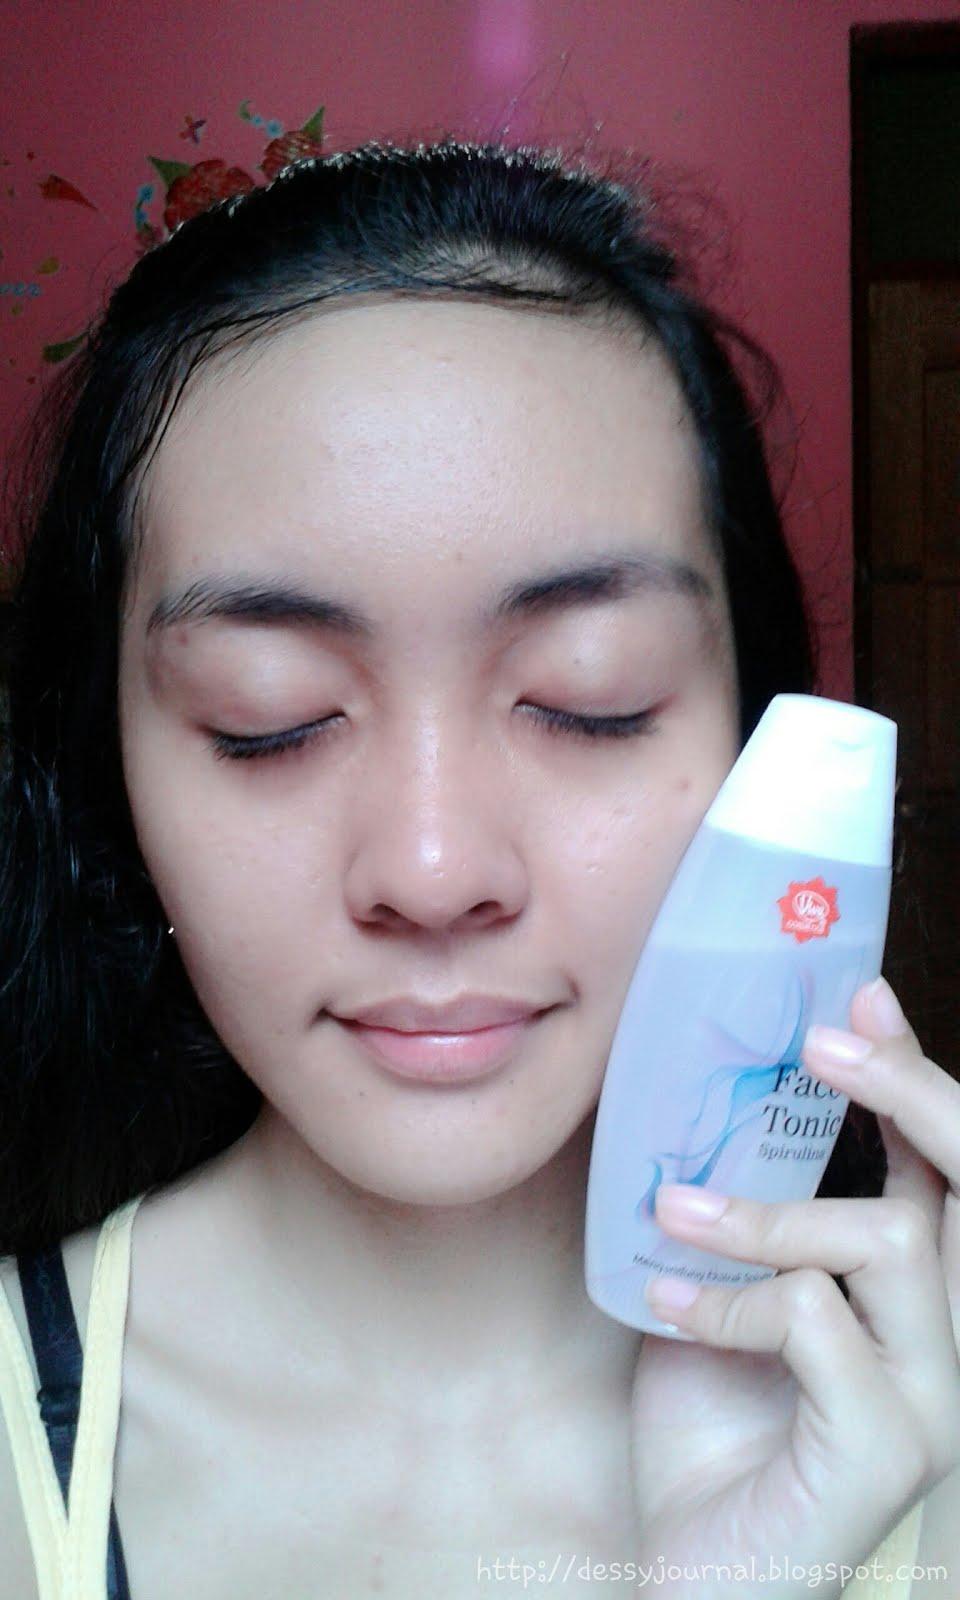 Dessy Journal Review Viva Milk Cleanser Face Tonic Spirulina Paket Pembersih Wajah Green Tea Cosmetics Katanya Dengan Melakukan Dua Langkah Pembersihan Pakai Ini Secara Teratur Dapat Menjadikan